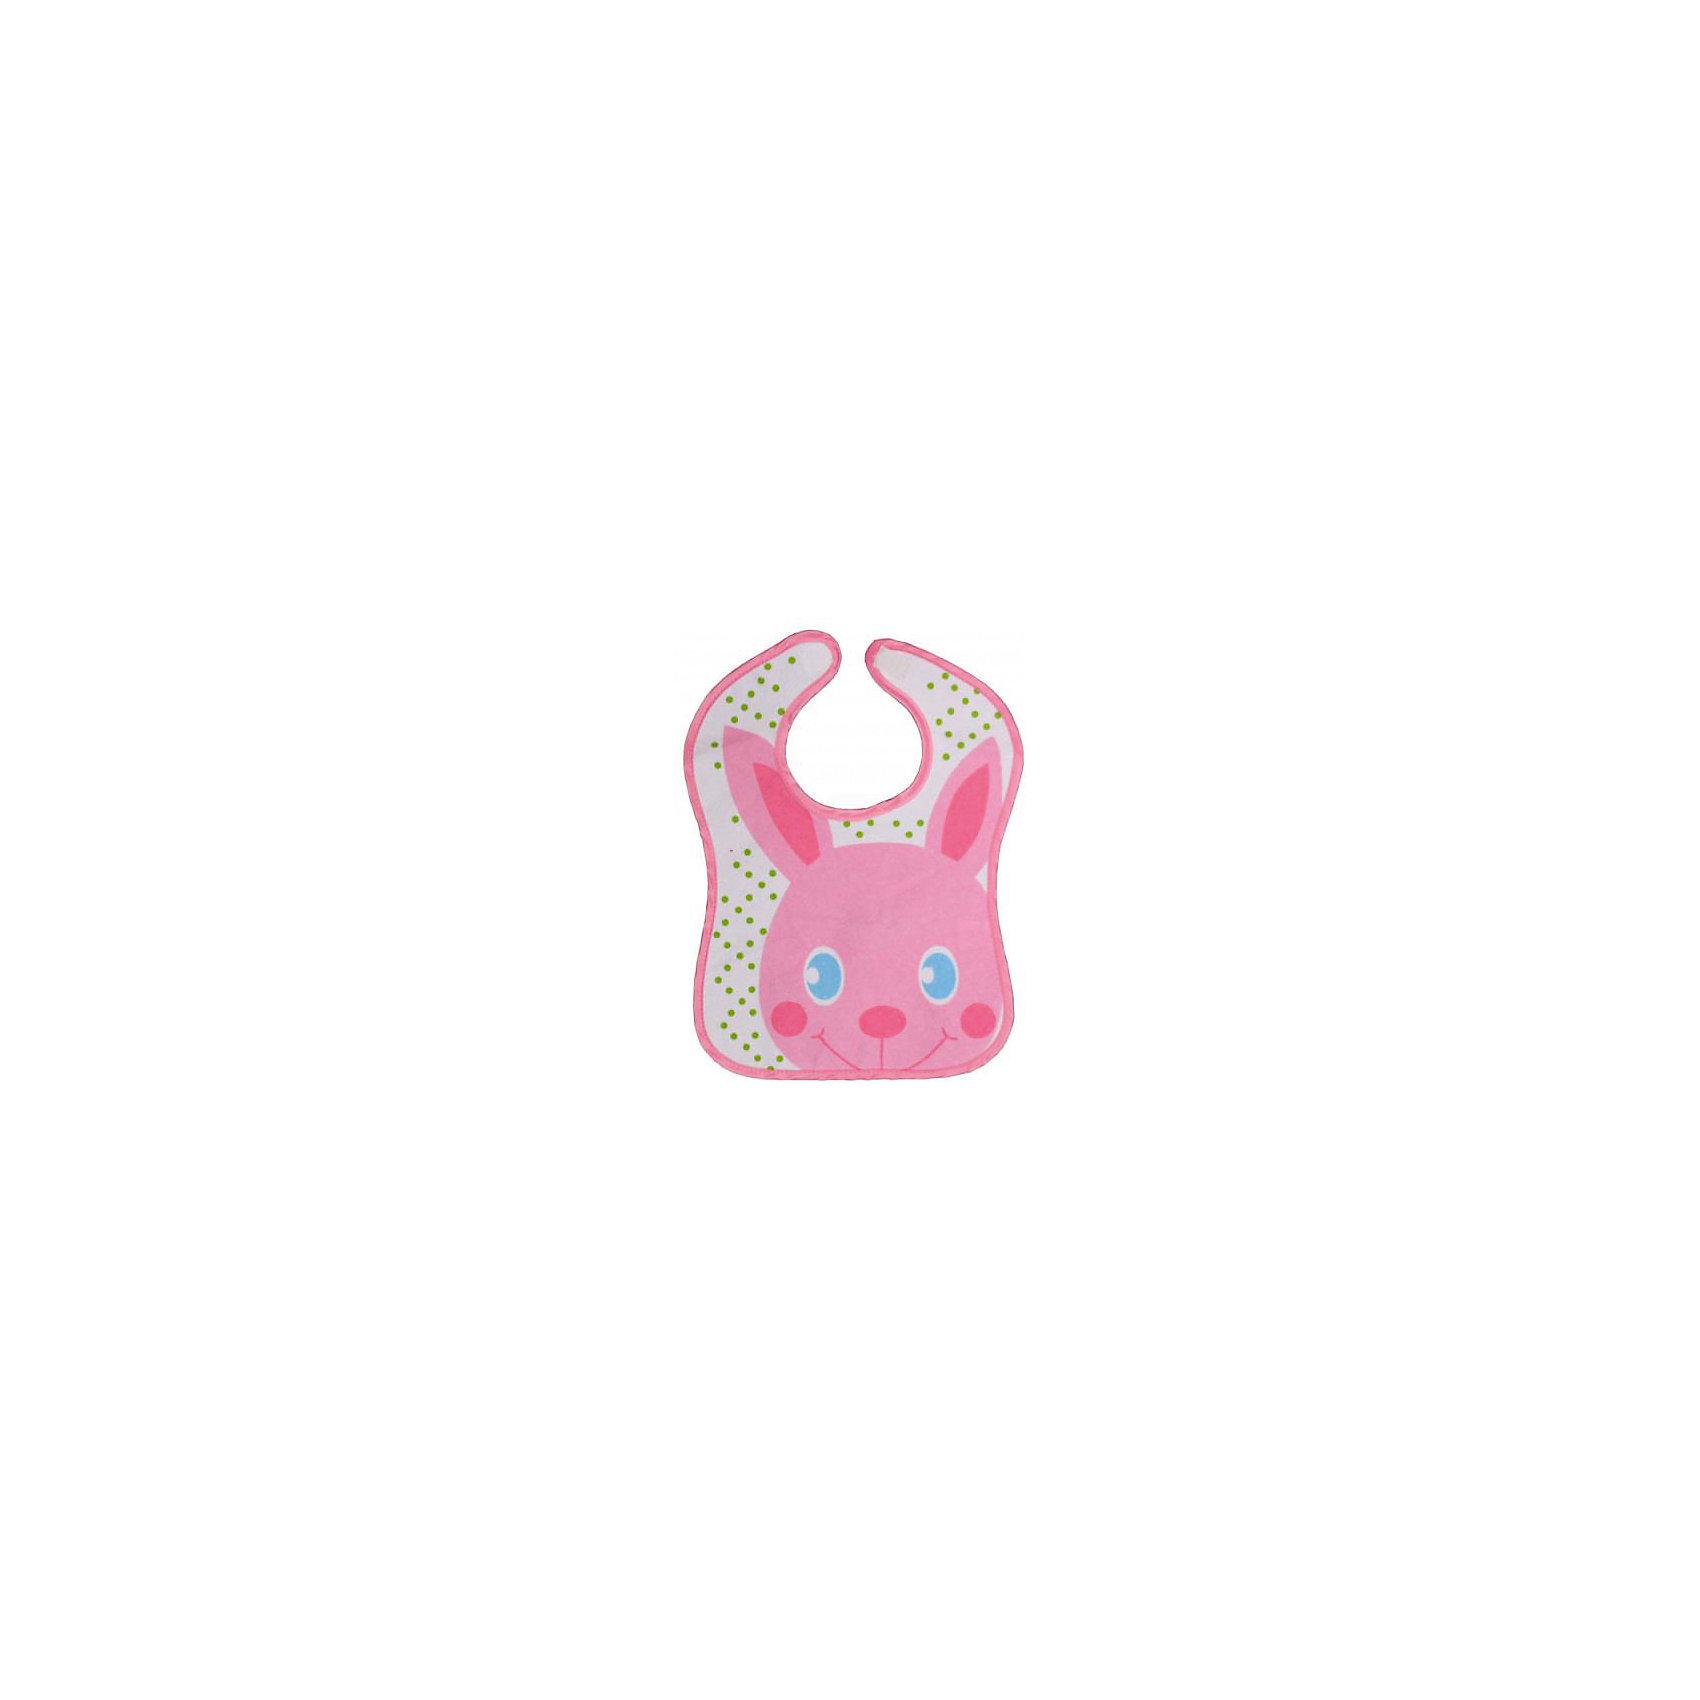 Нагрудник махровый Зайка Sevi baby, розовый (Sevi Baby)